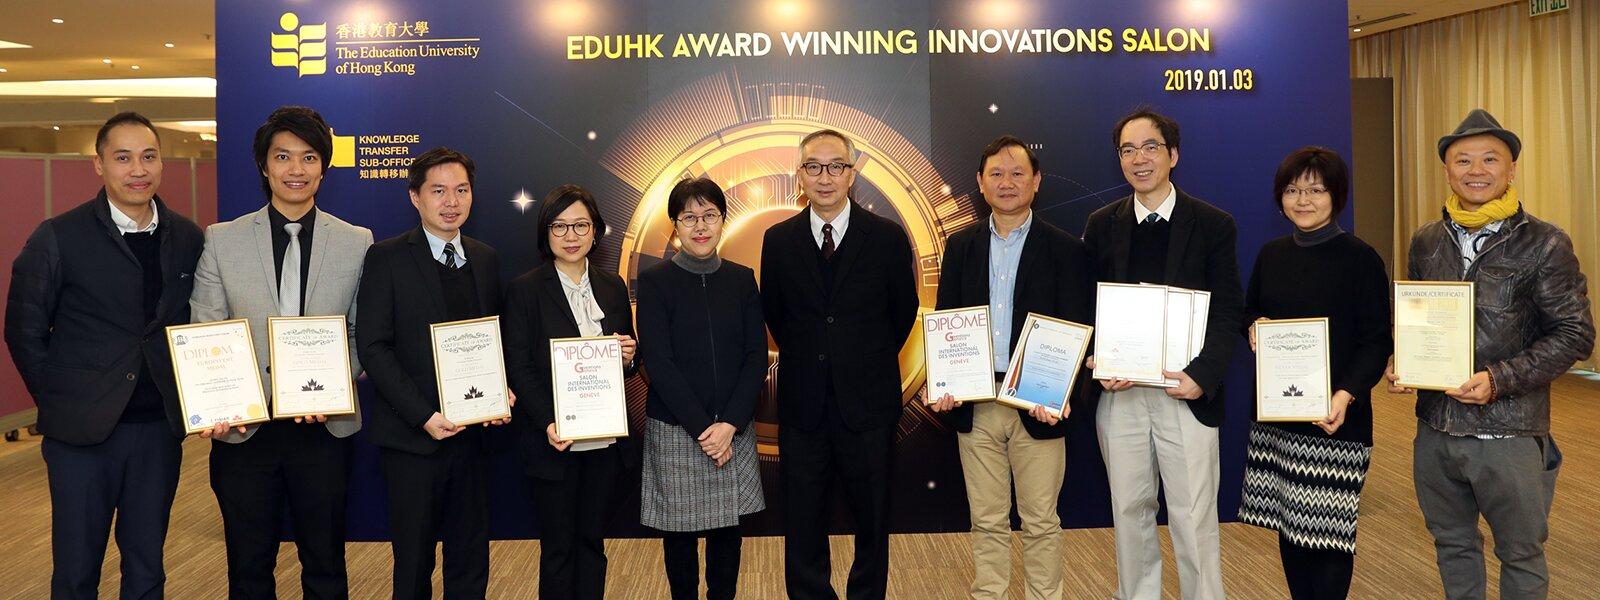 Innovation for Change – EdUHK Award Winning Innovations Salon